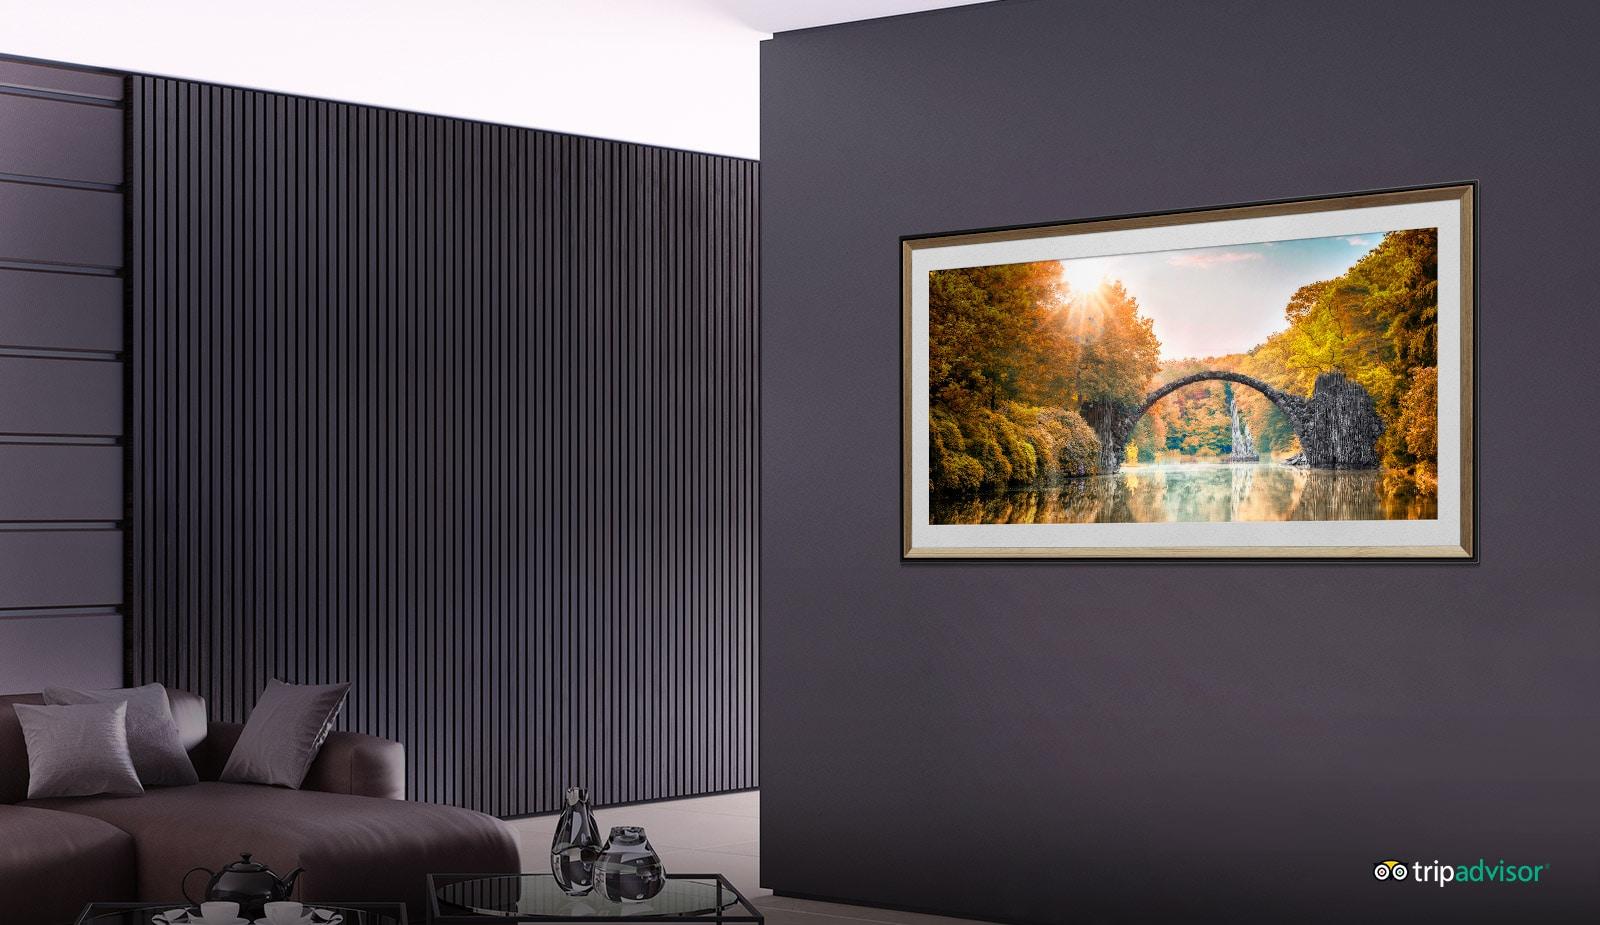 TV-OLED-C9-08-Gallery-Mode-Desktop